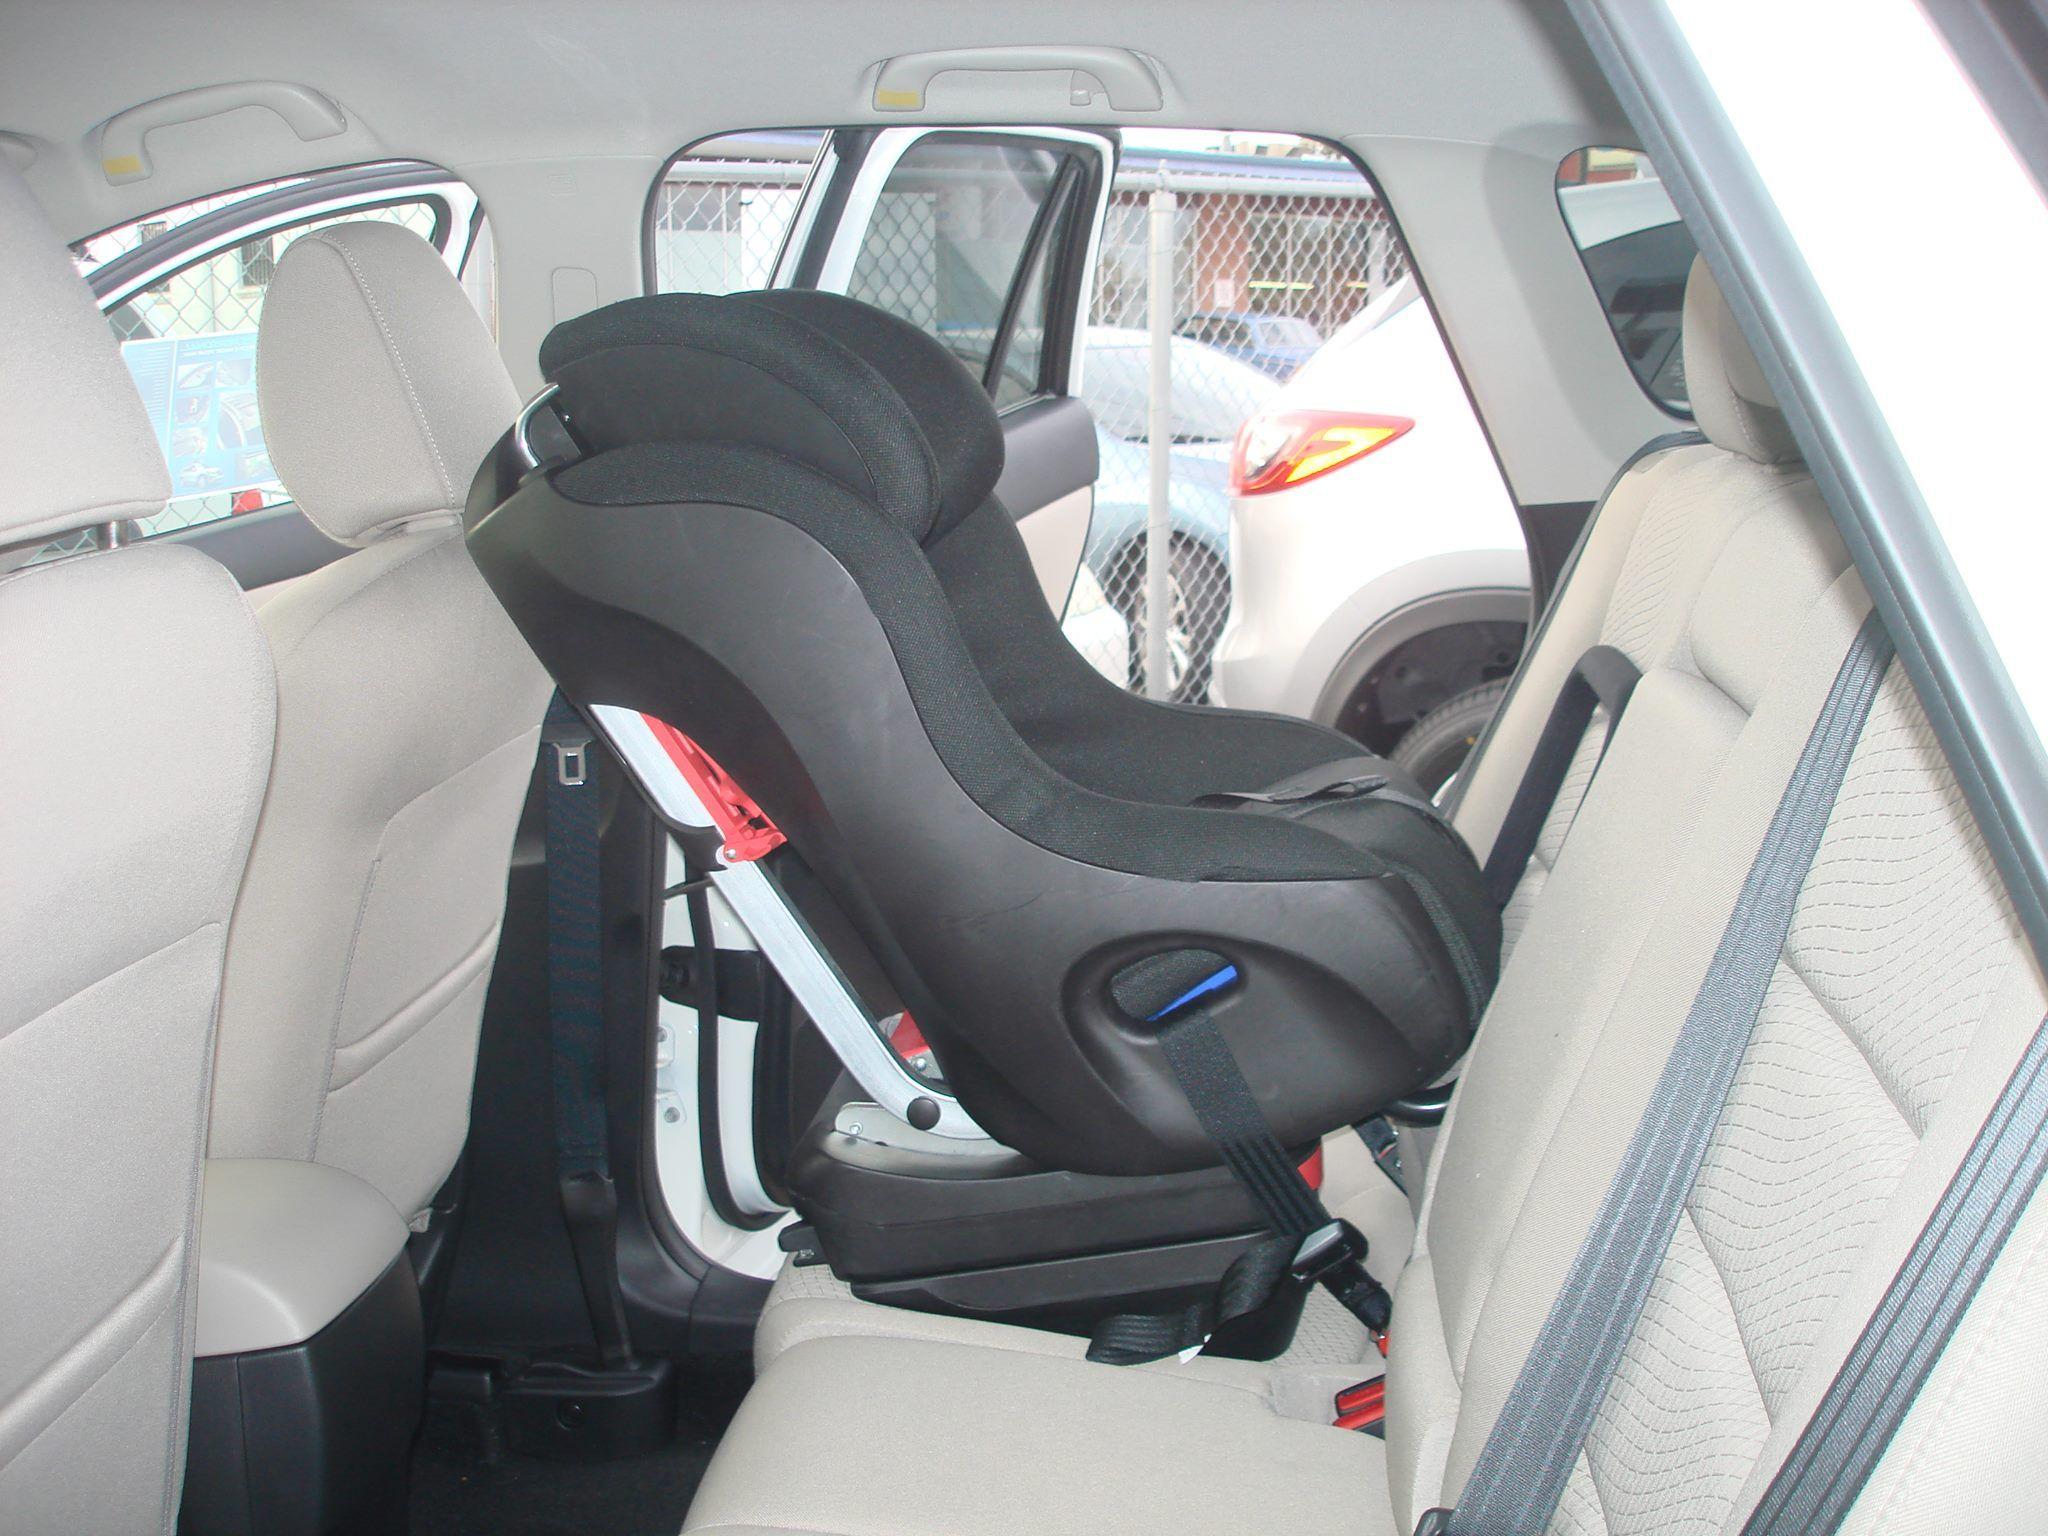 Clek Foonf Rear Facing In A Mazda Cx 5